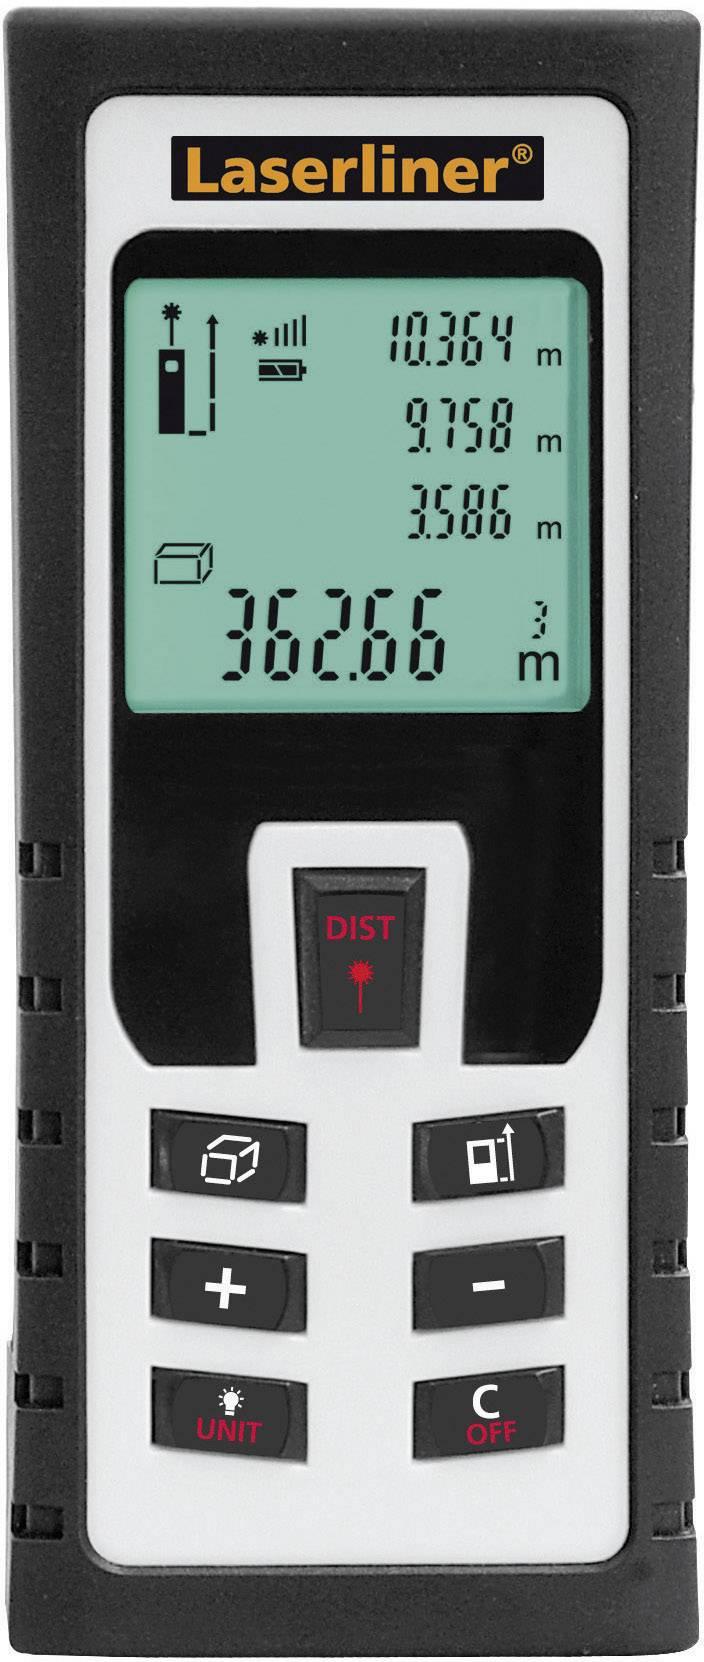 Laserliner DistanceMaster 100 Telemetro laser Adattatore treppiede 6,3 mm (1/4) Intervallo di misura (Max.) 100 m